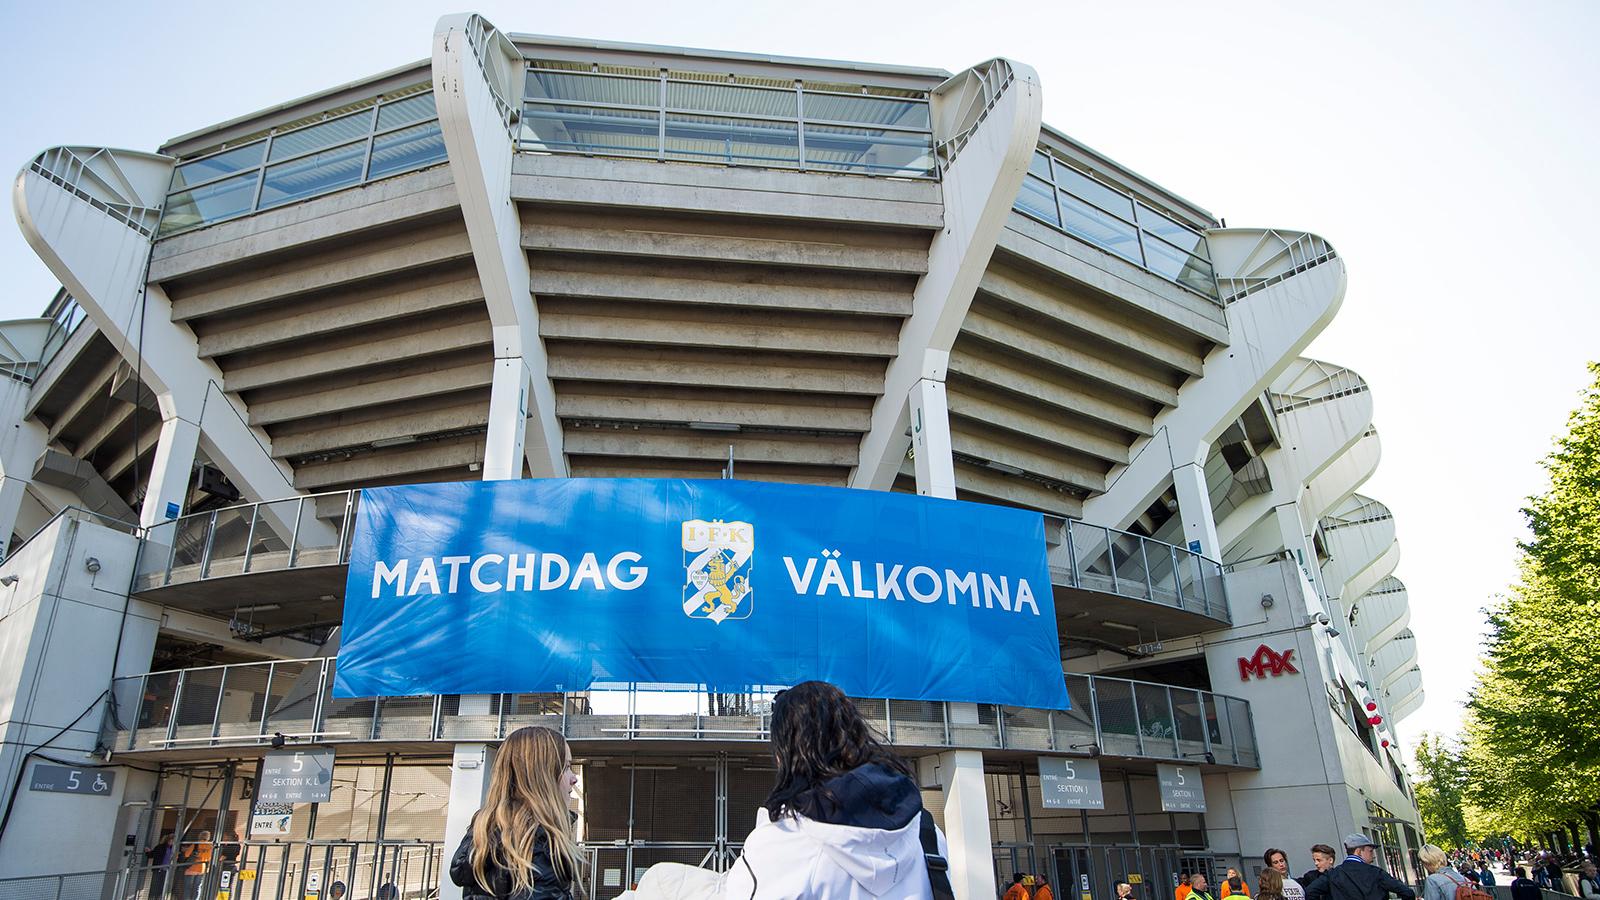 Matchdag 2017 Gamla Ullevi